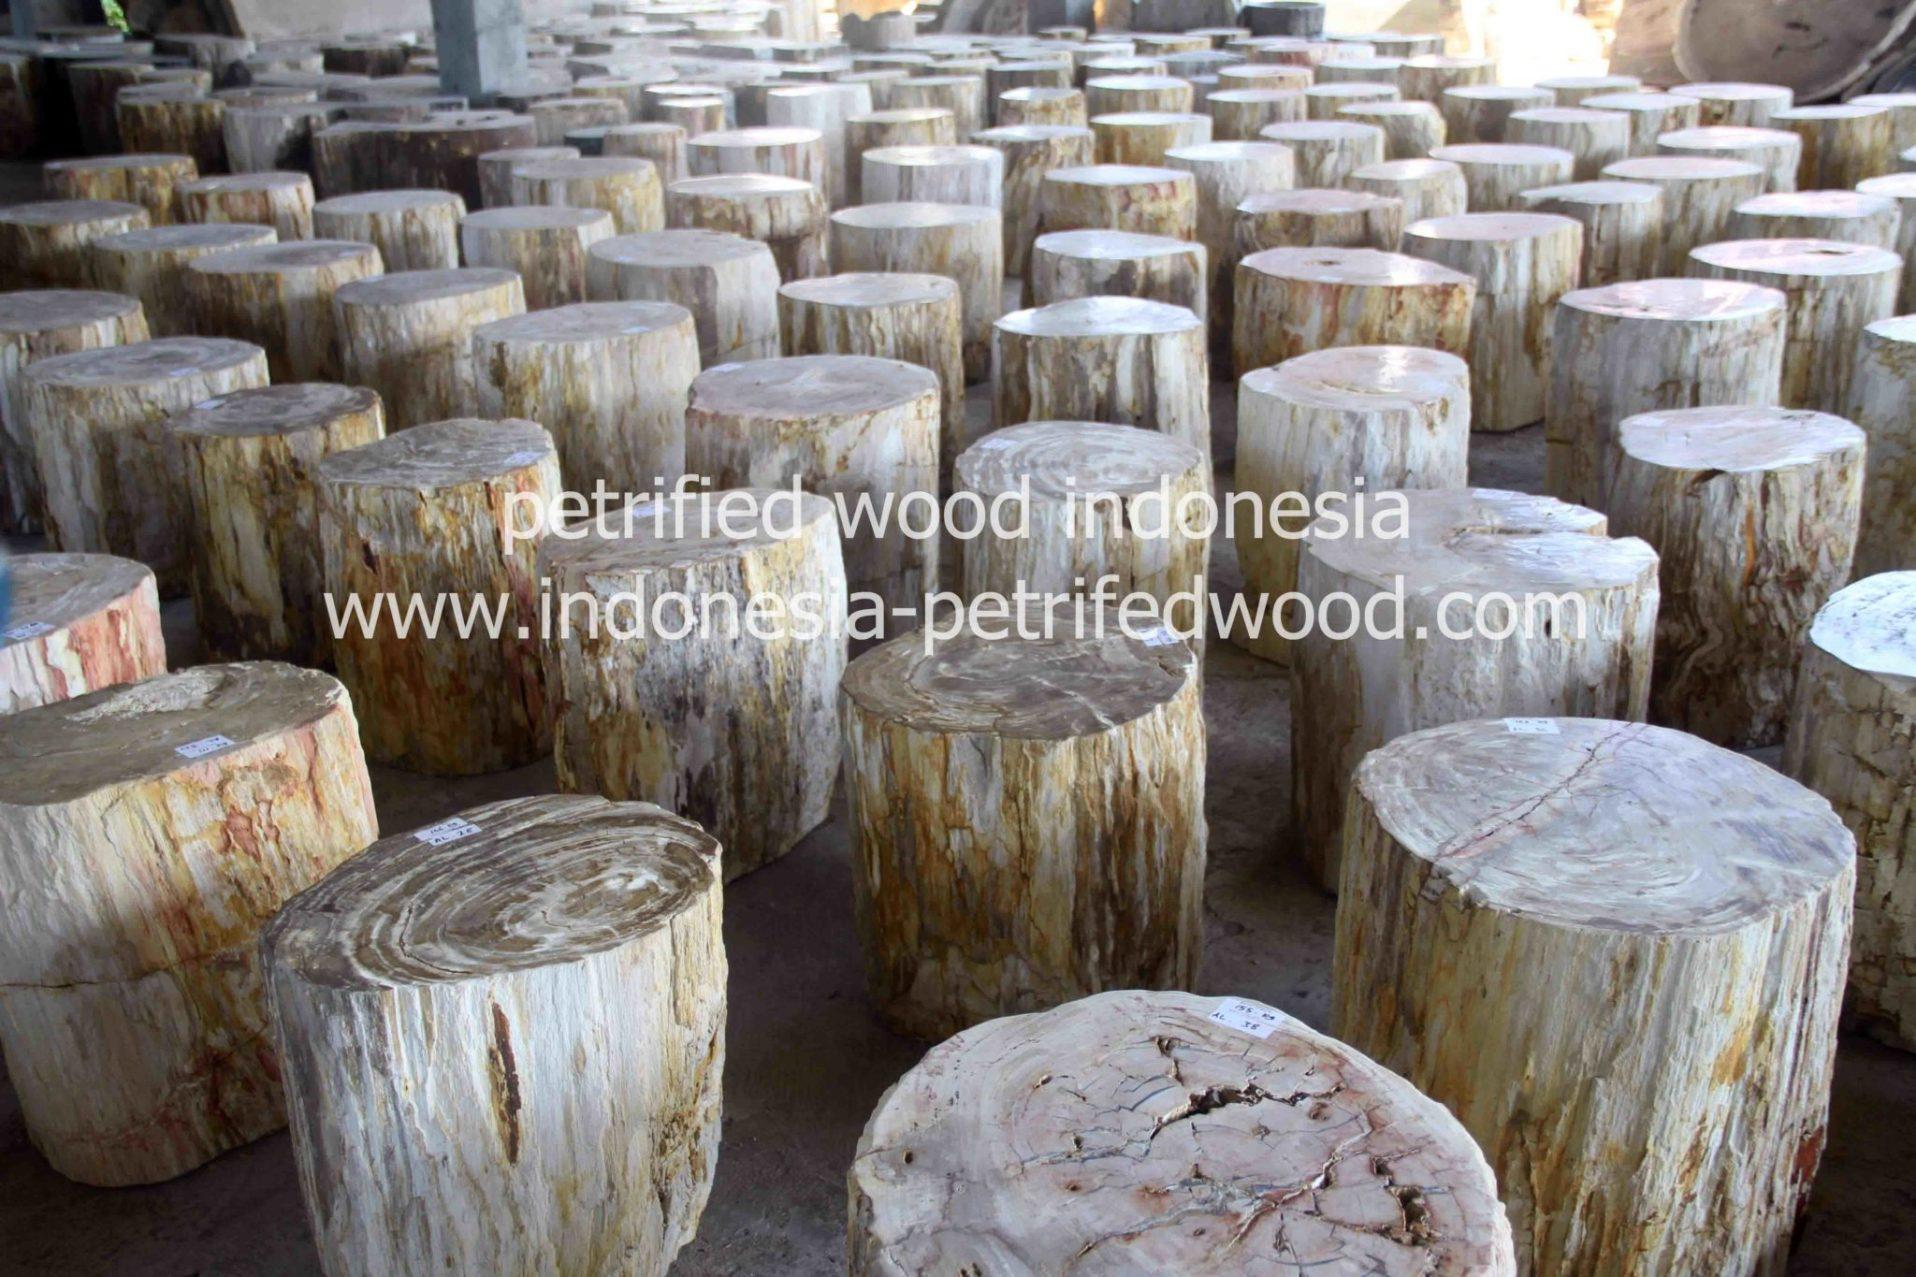 petrified wood indonesia factory